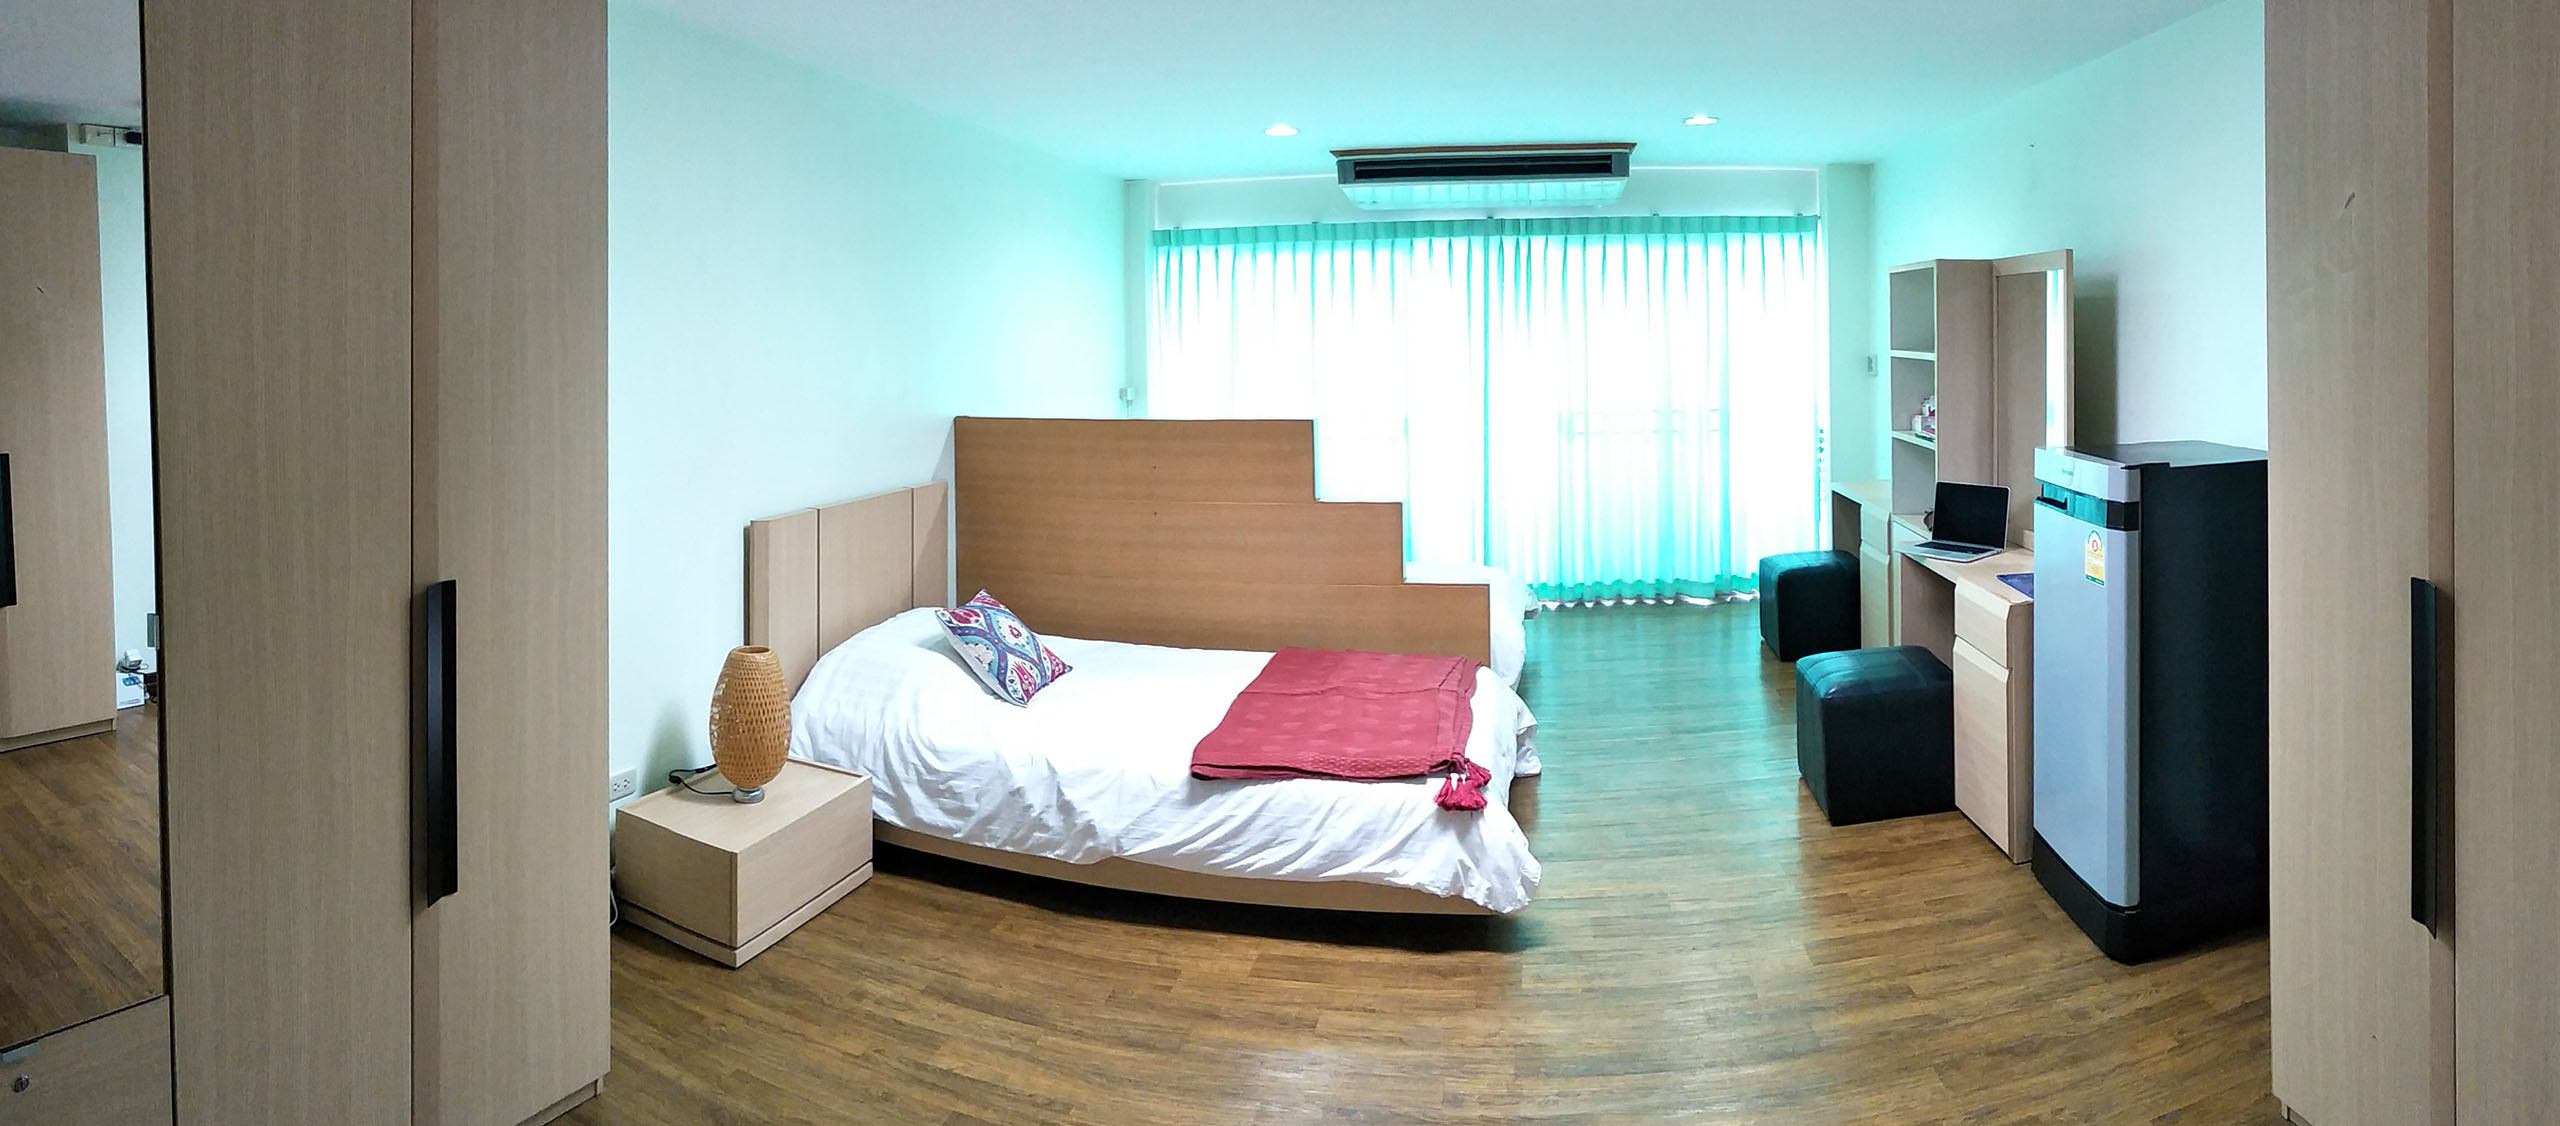 Seelos Residence - Bedroom-min-min